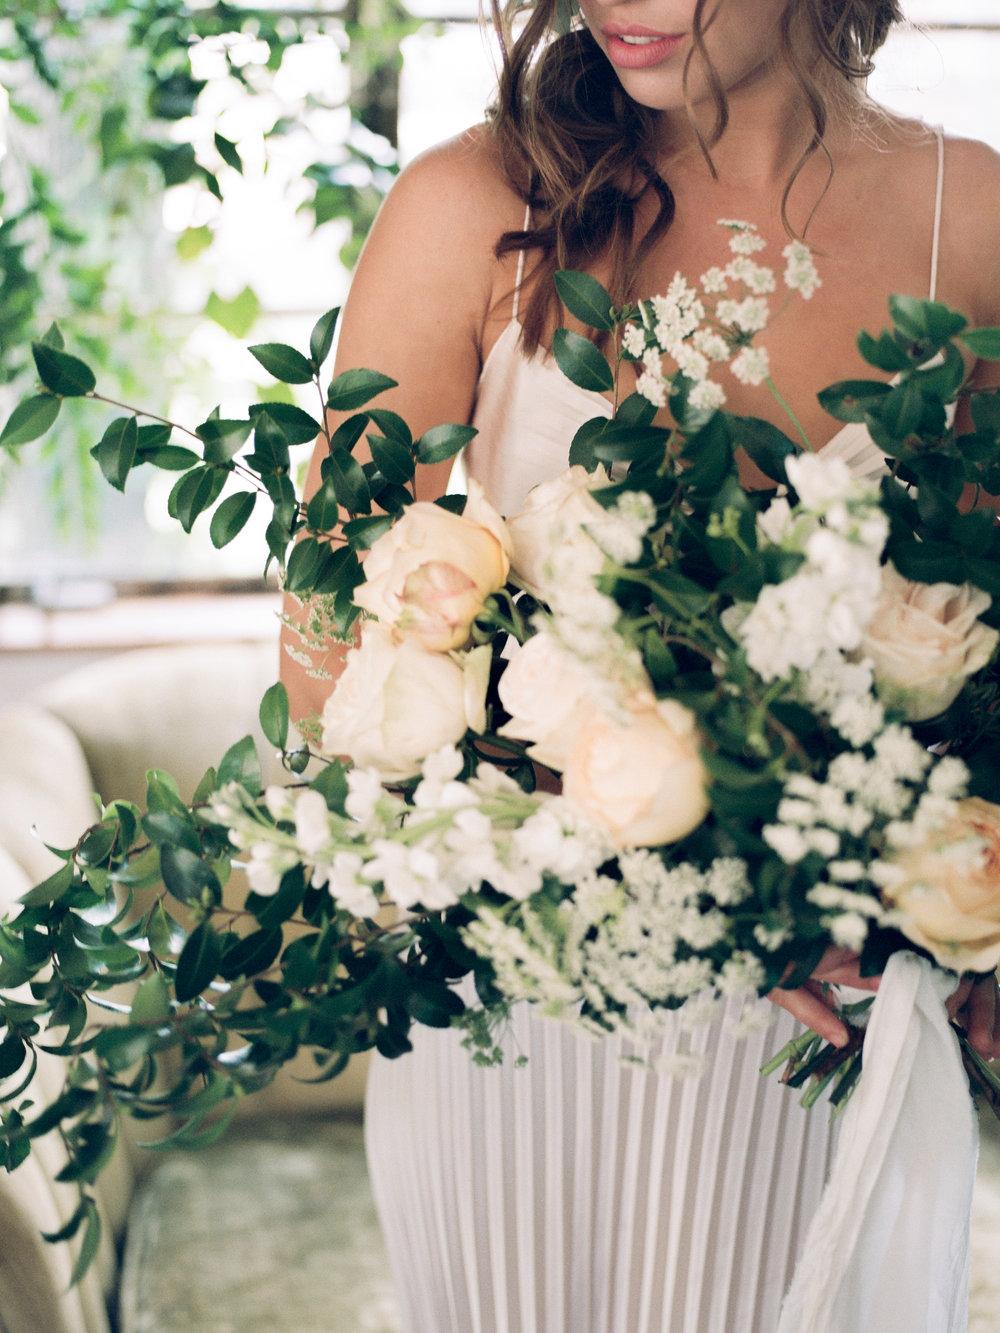 tallahassee_florida_wedding_florist_moonstruck_florals.jpg